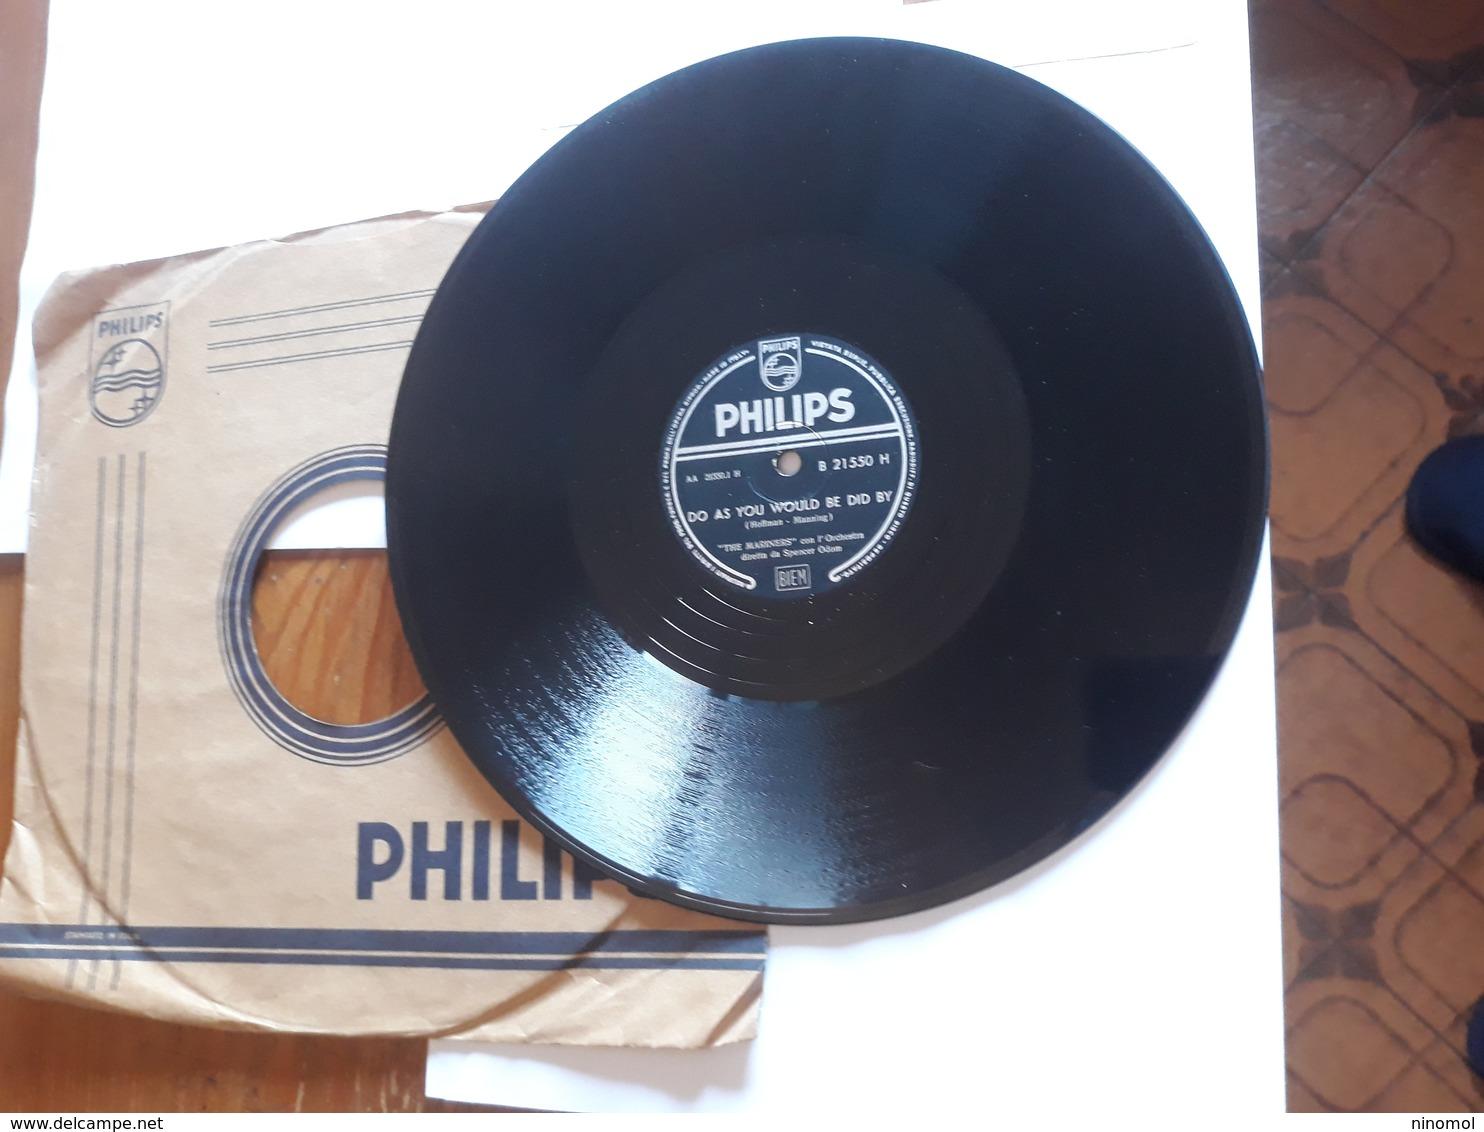 "Philips  -  Nr. B 21550 H -  "" The Mariners "" - 78 G - Dischi Per Fonografi"